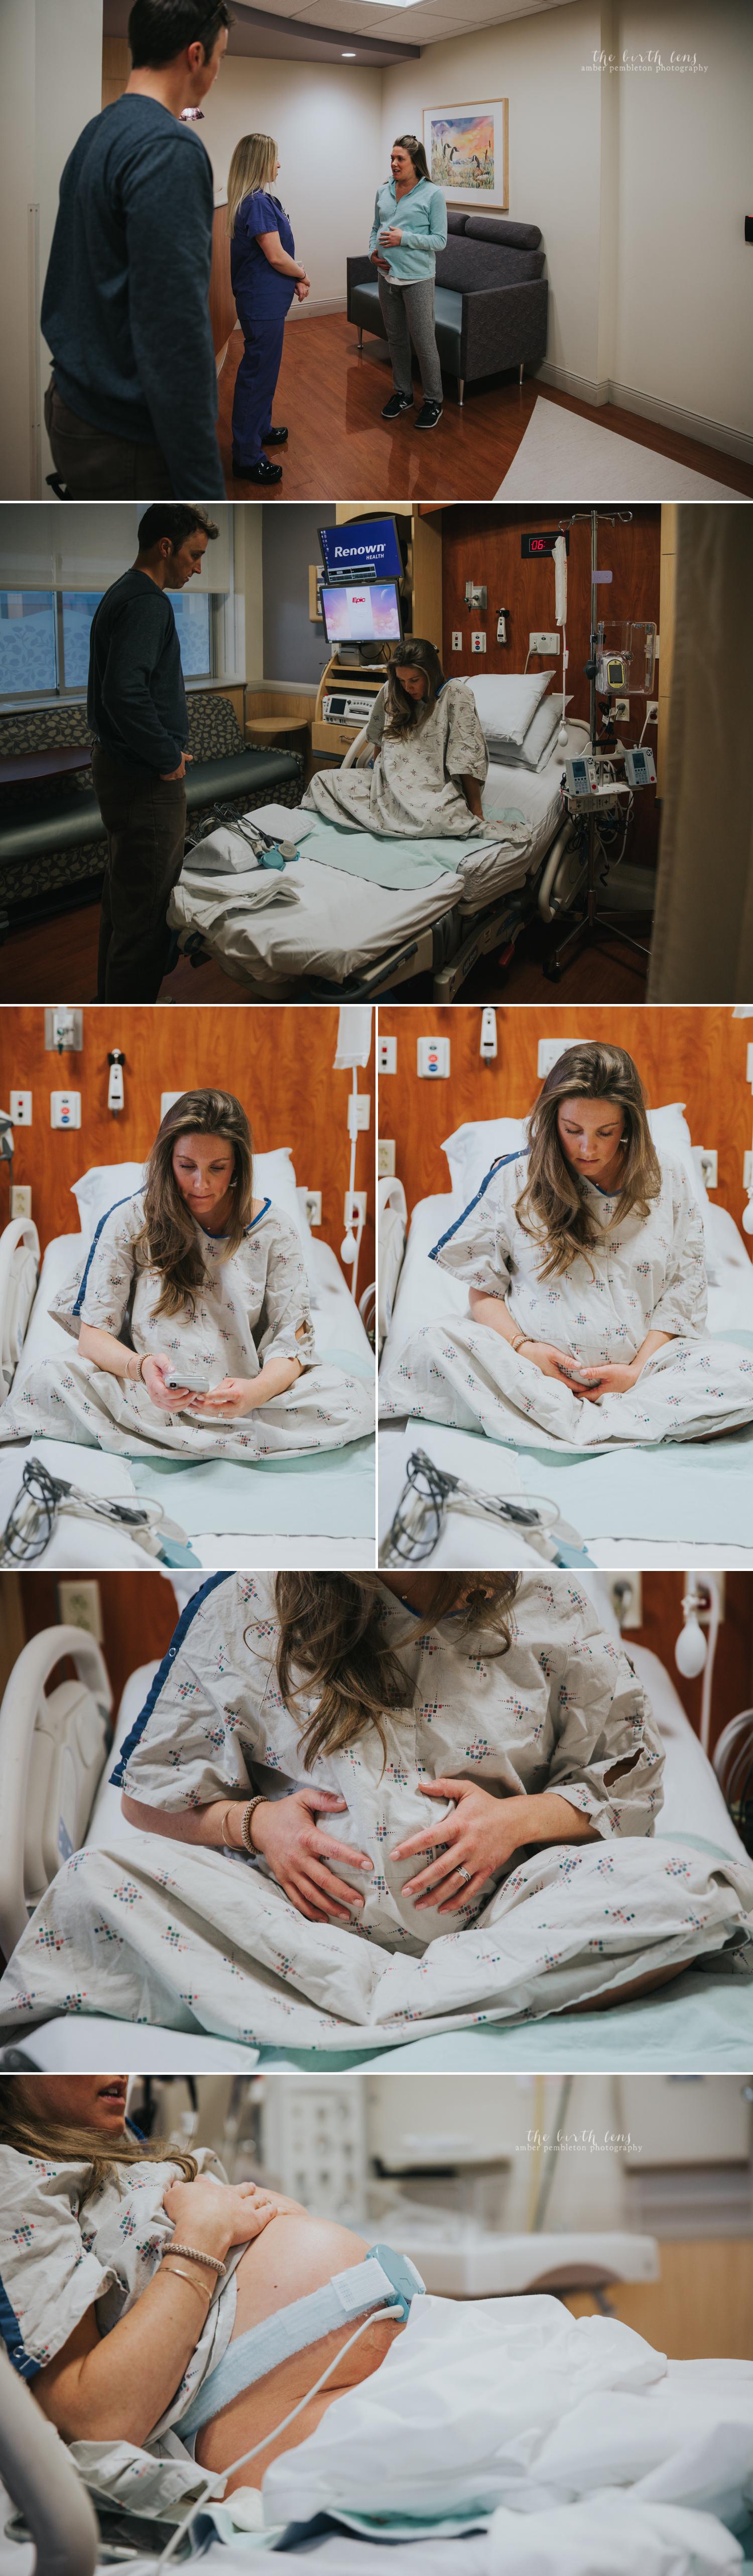 reno-hospital-birth.jpg